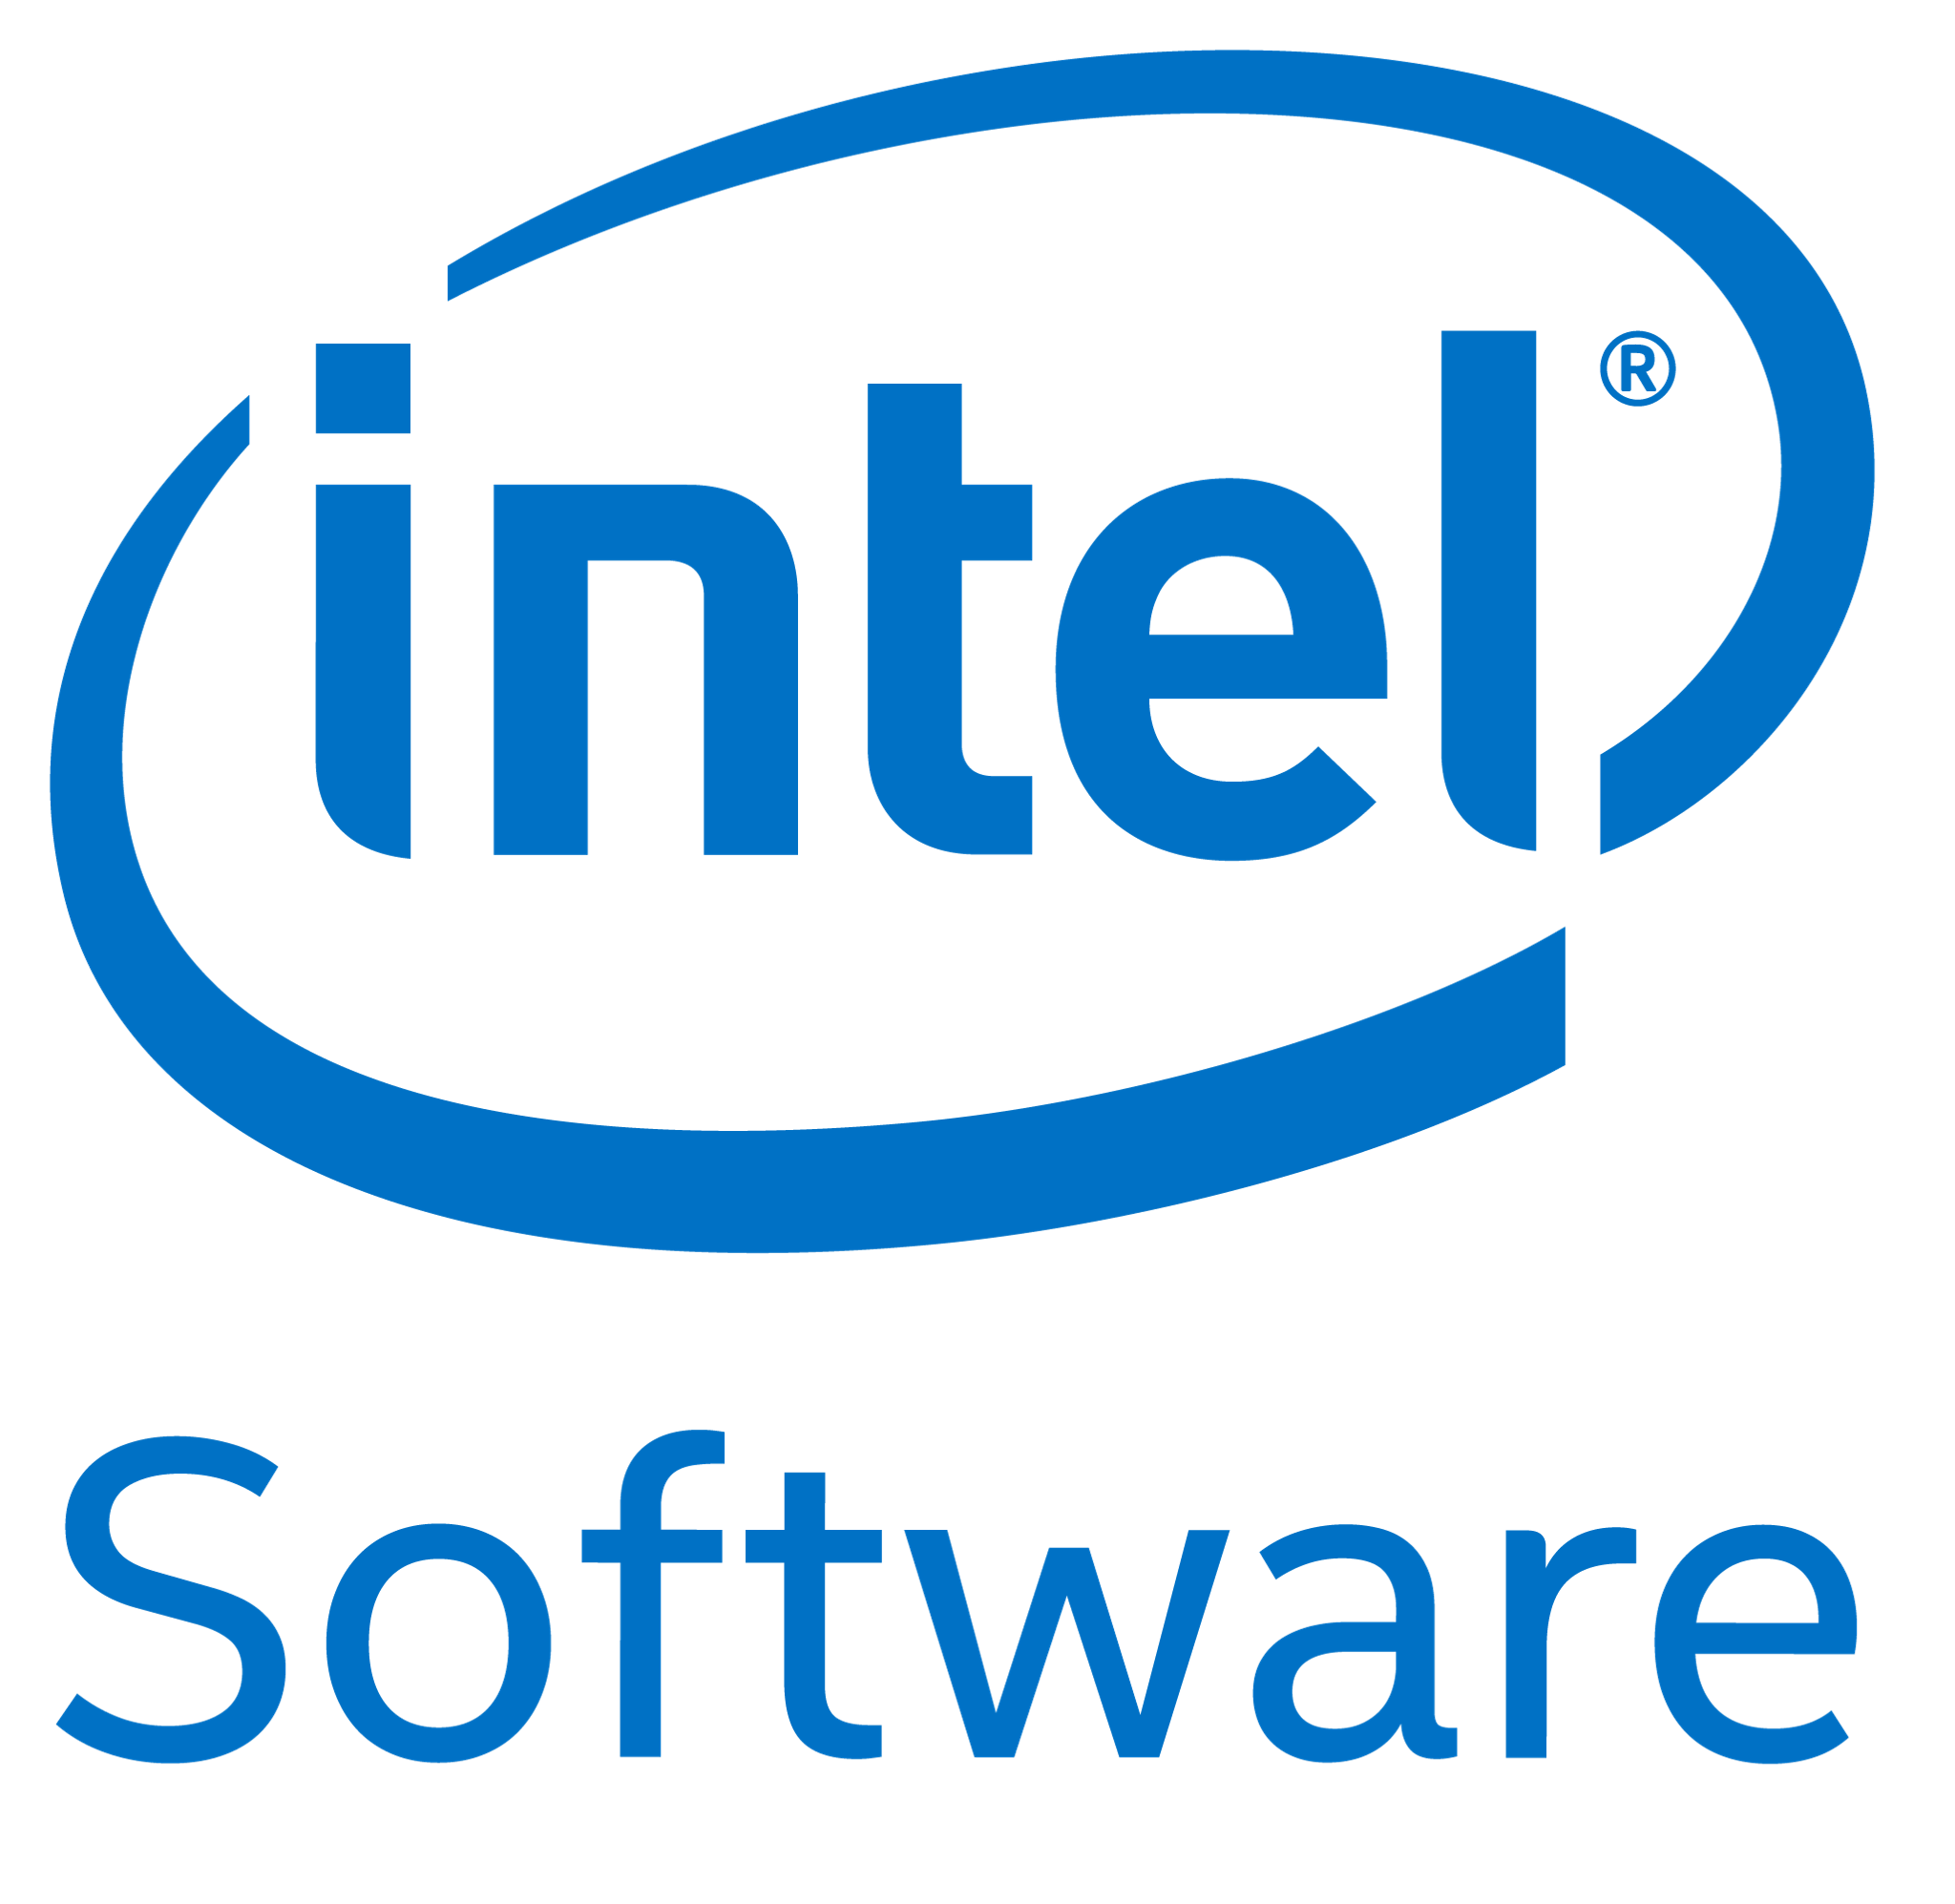 StackedIntelSoftwareBlue.png